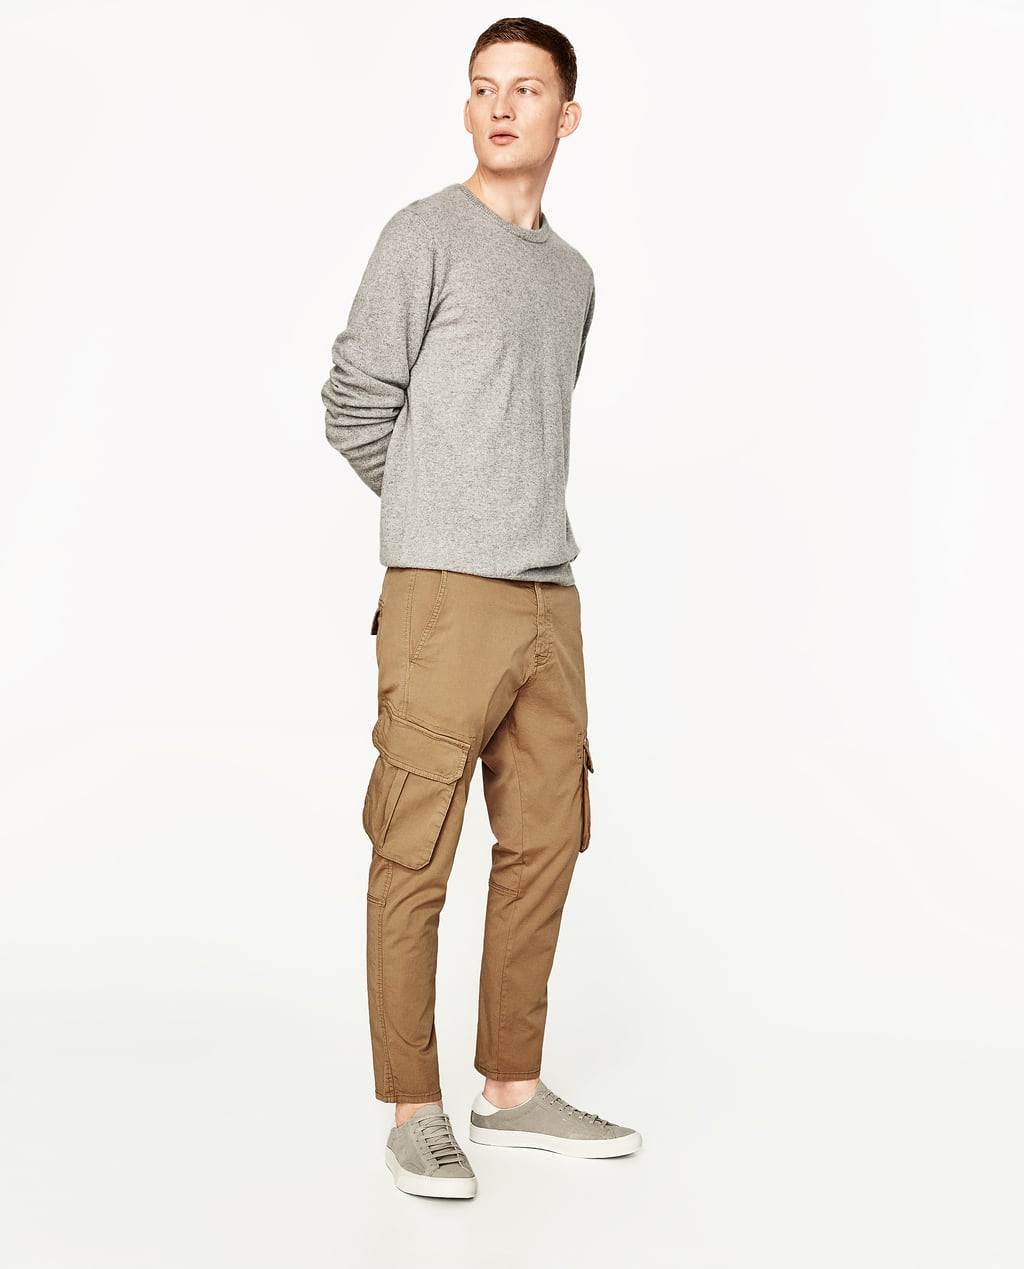 pantalon homme zara maroc